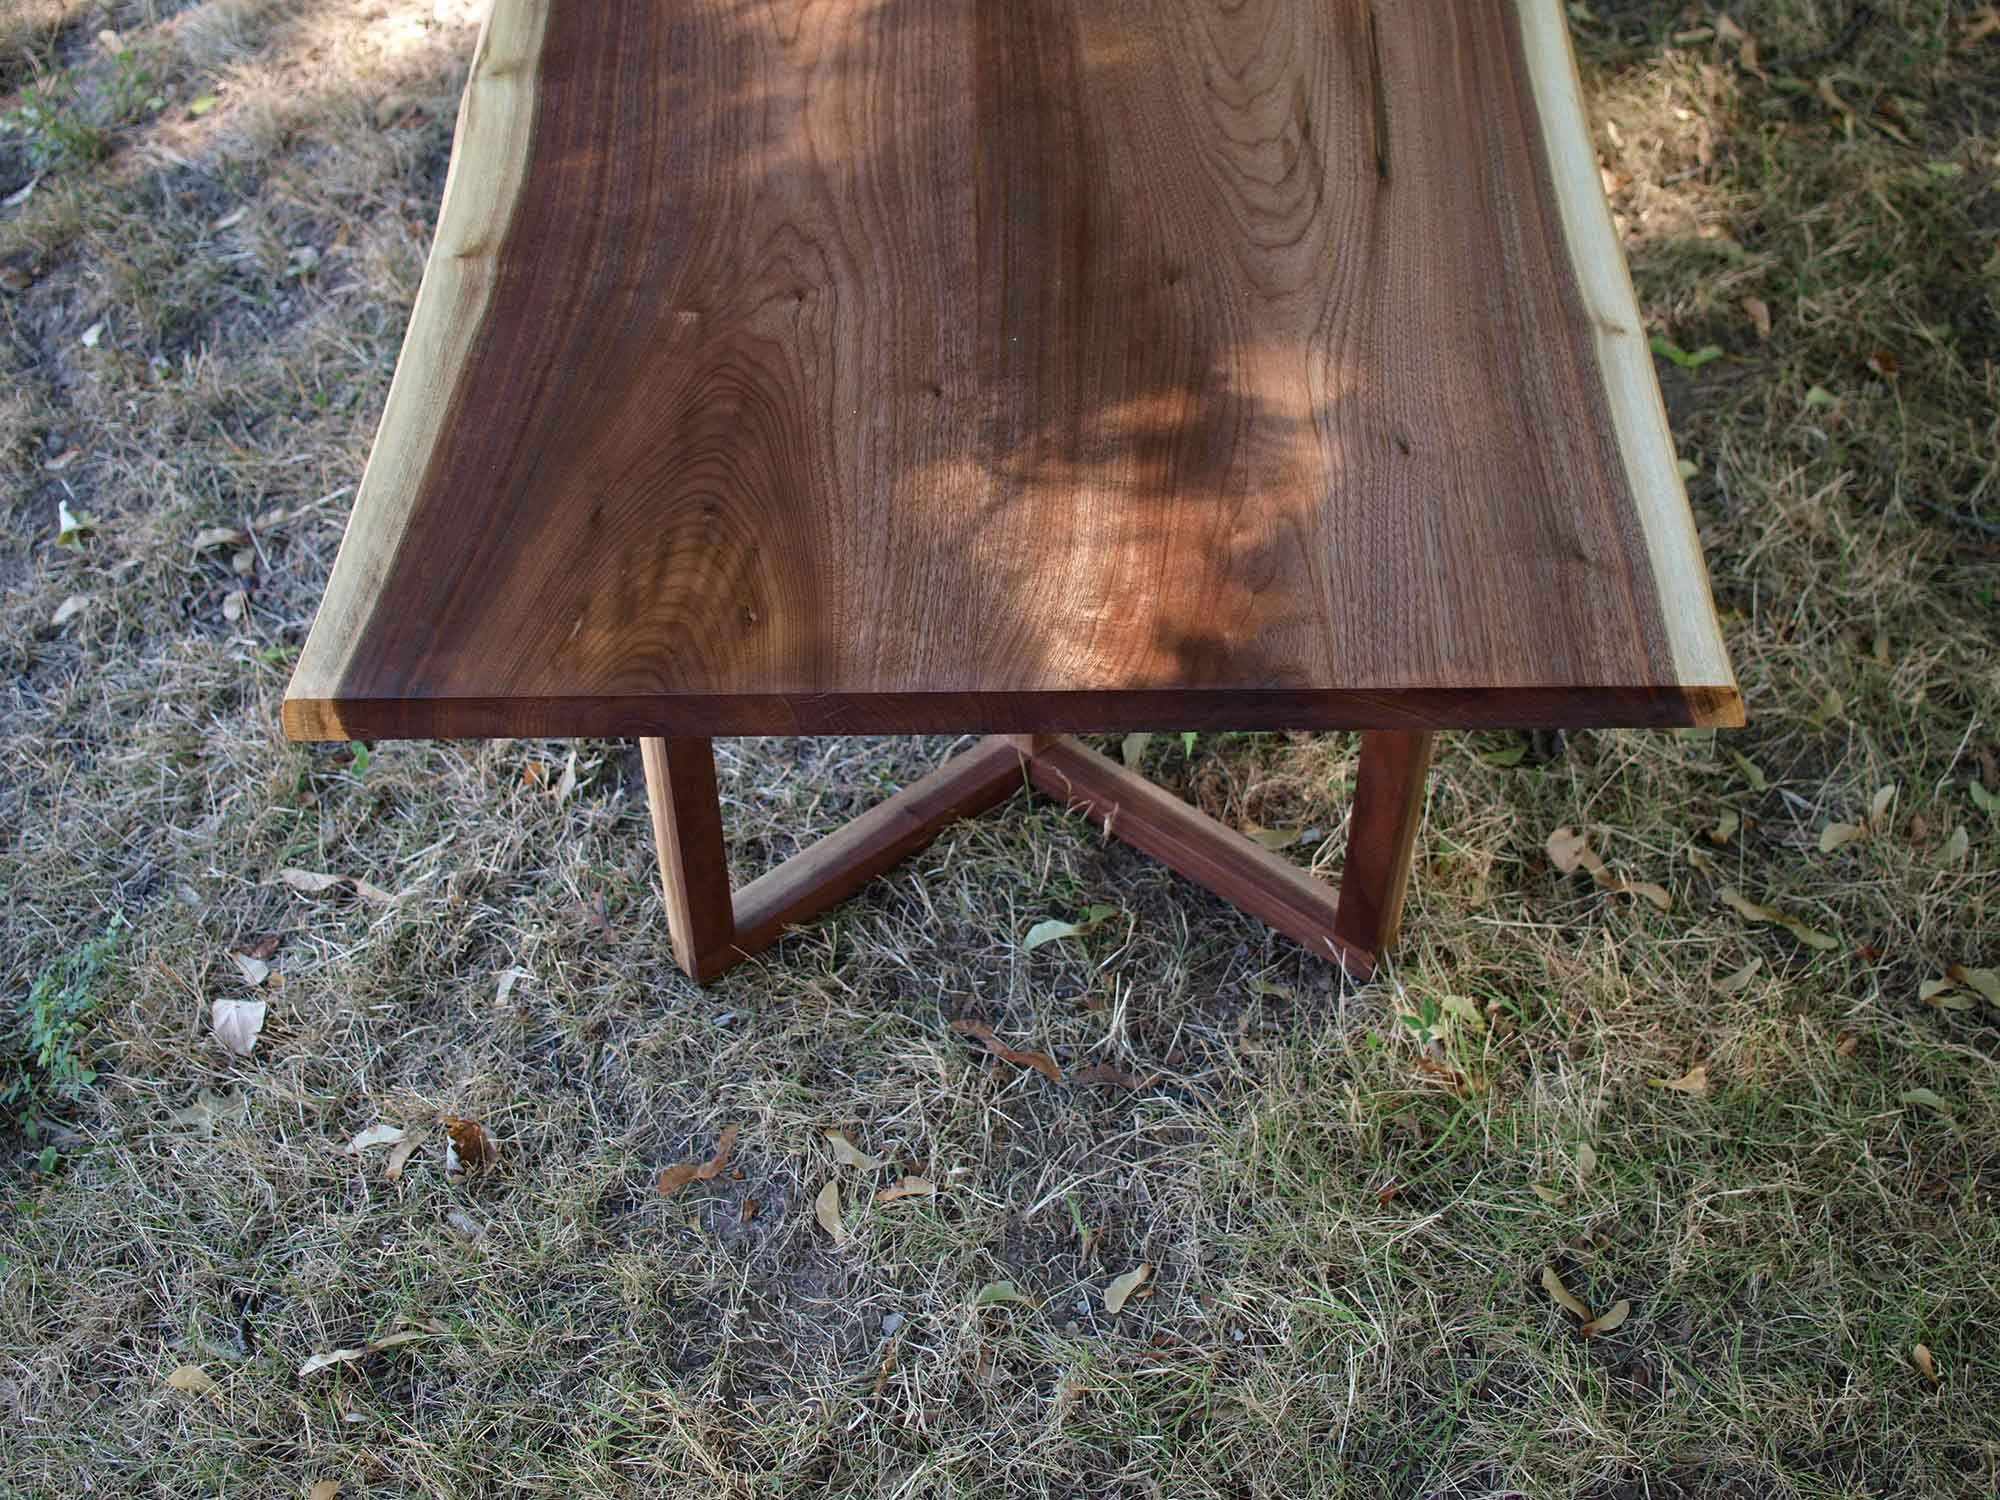 wickham-open-chevron-coffee-table-7261754.jpg